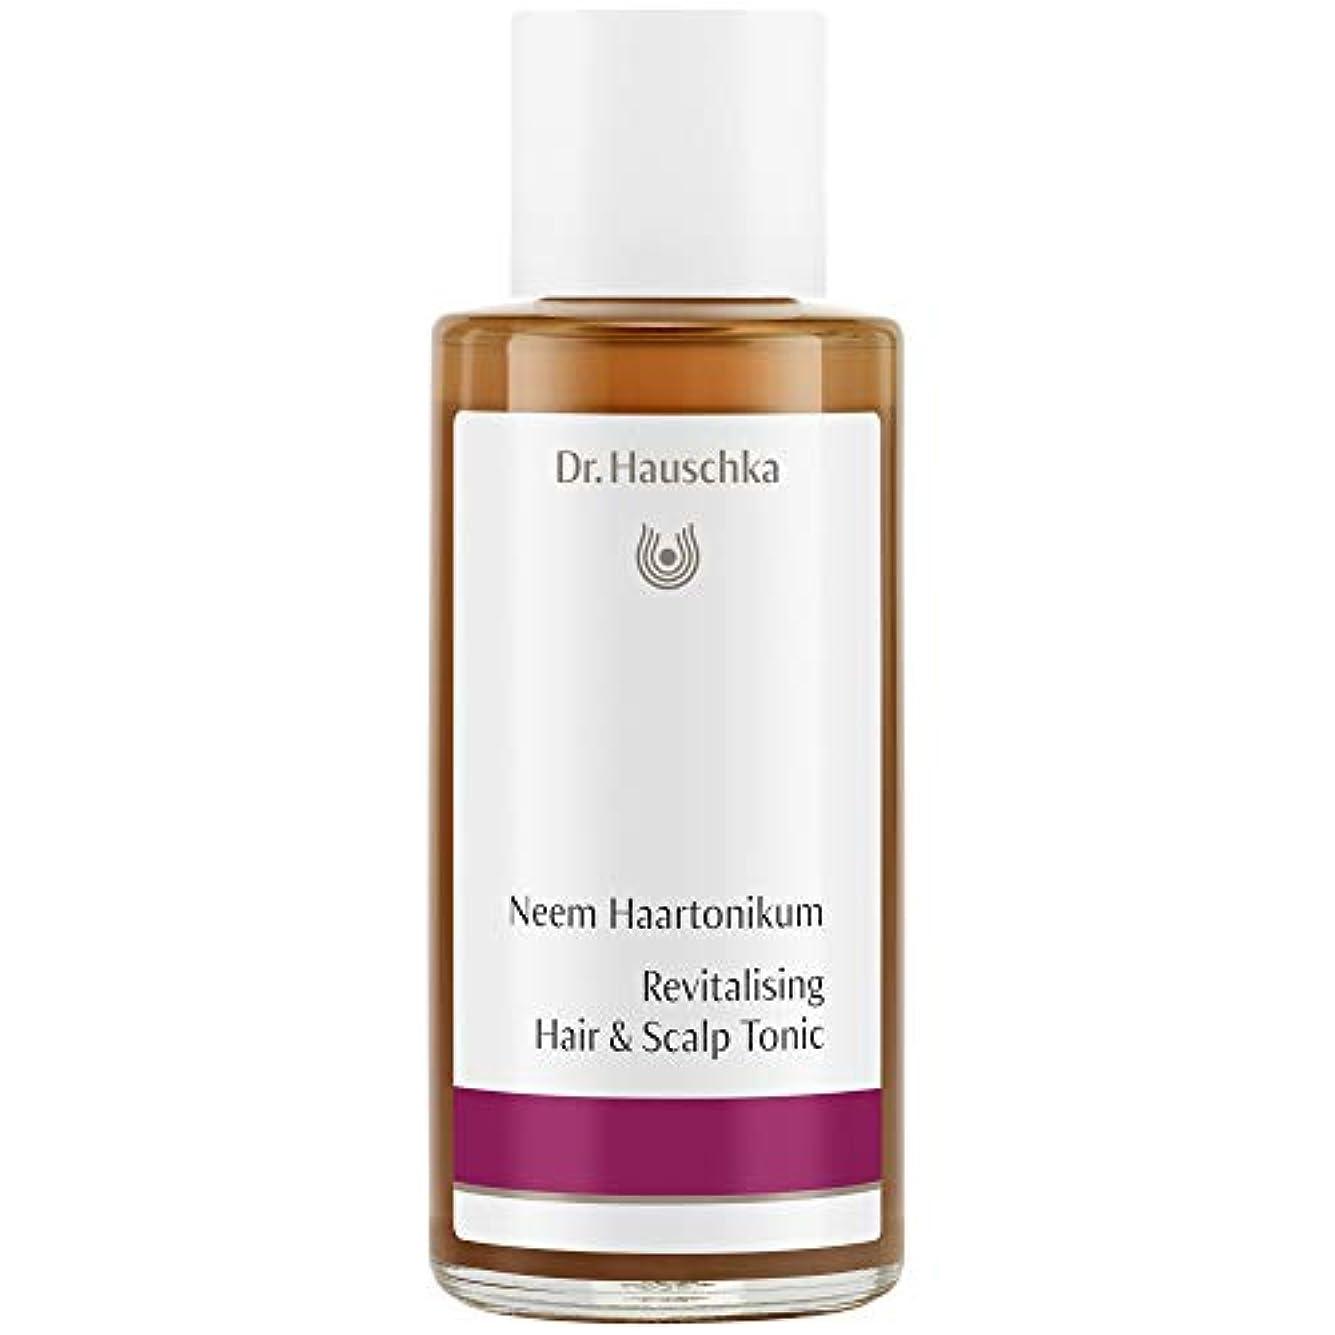 [Dr Hauschka] Drハウシュカニームヘアローション100ミリリットル - Dr Hauschka Neem Hair Lotion 100ml [並行輸入品]